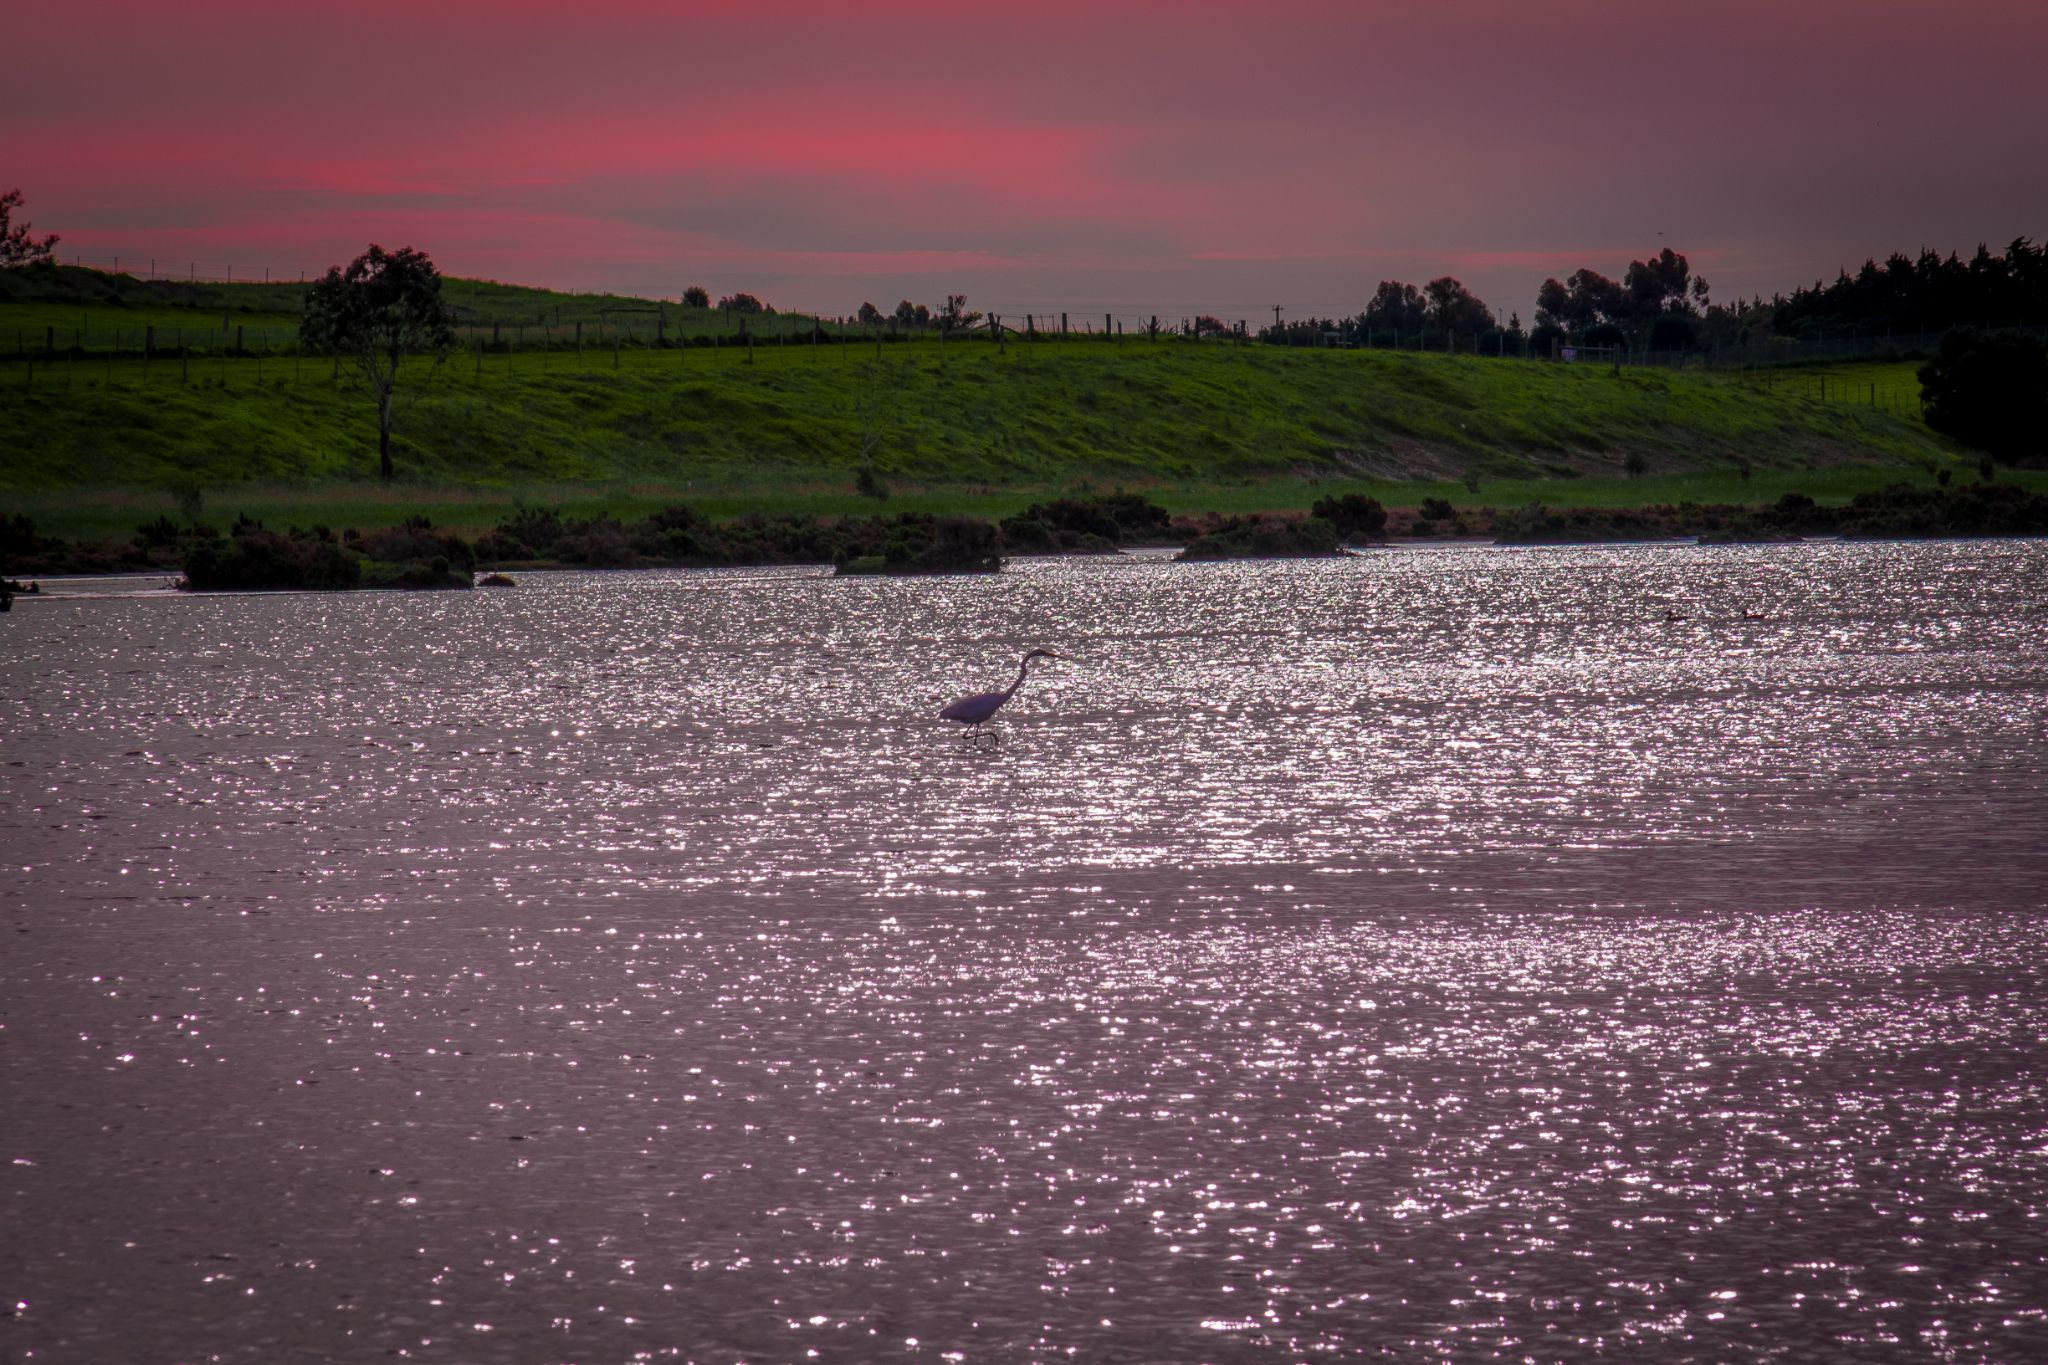 Majestic Sunset by MaddisonTrainor